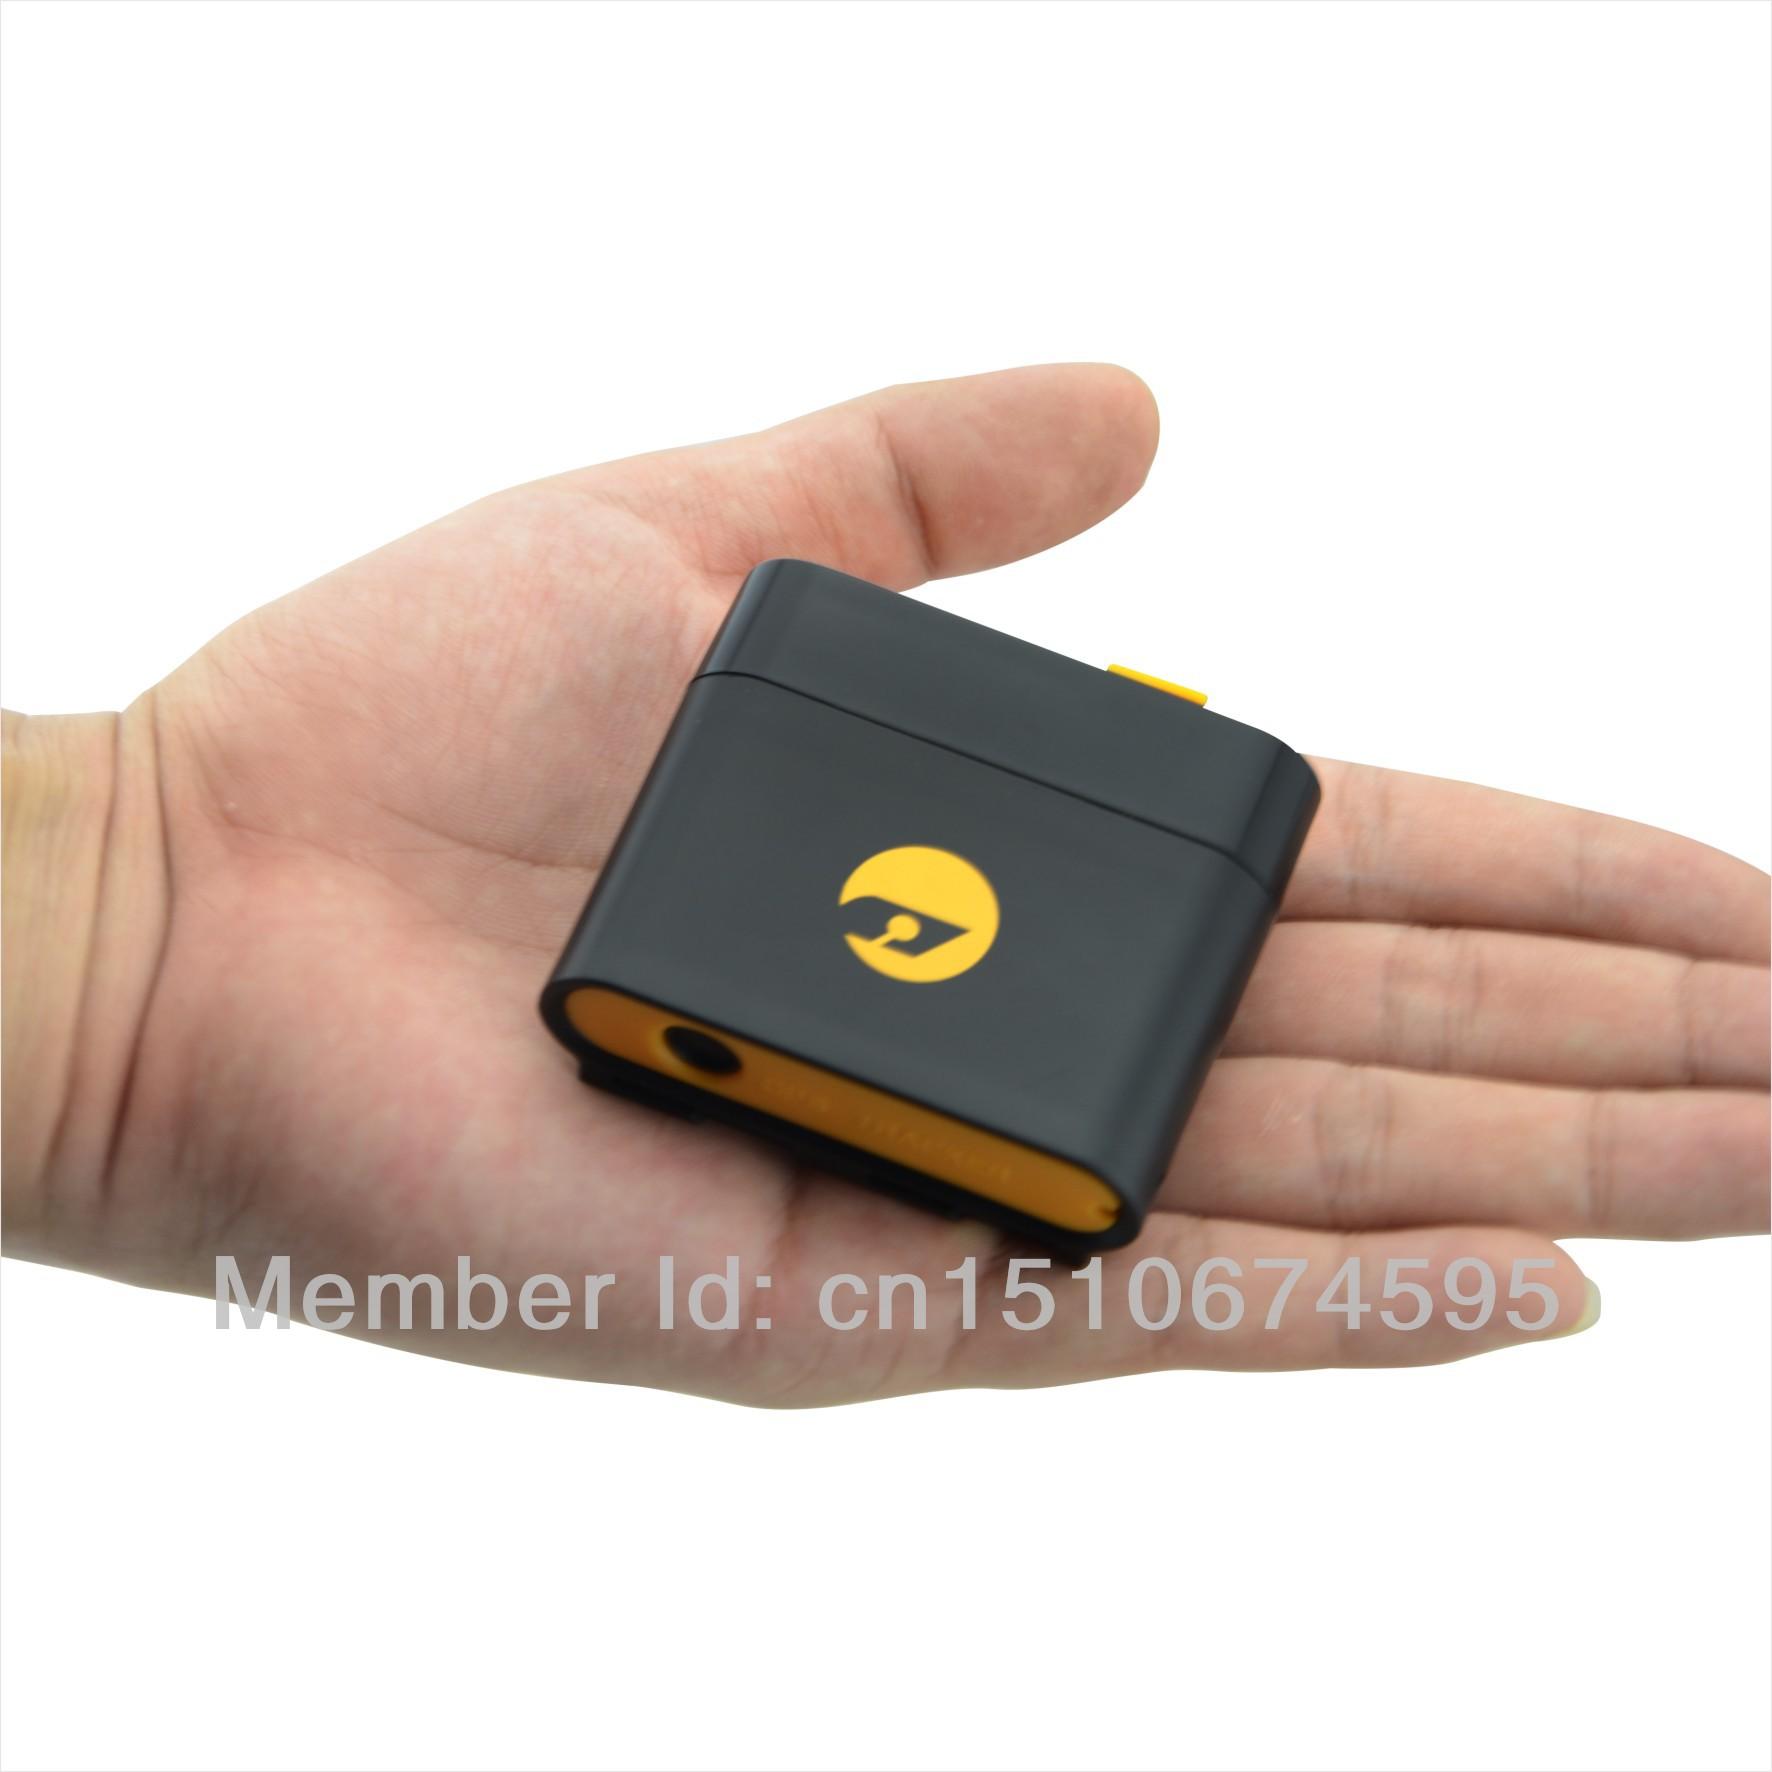 Image Name: Cheap Waterproof GPS Car Tracker tk 108 Free Shipping On ...